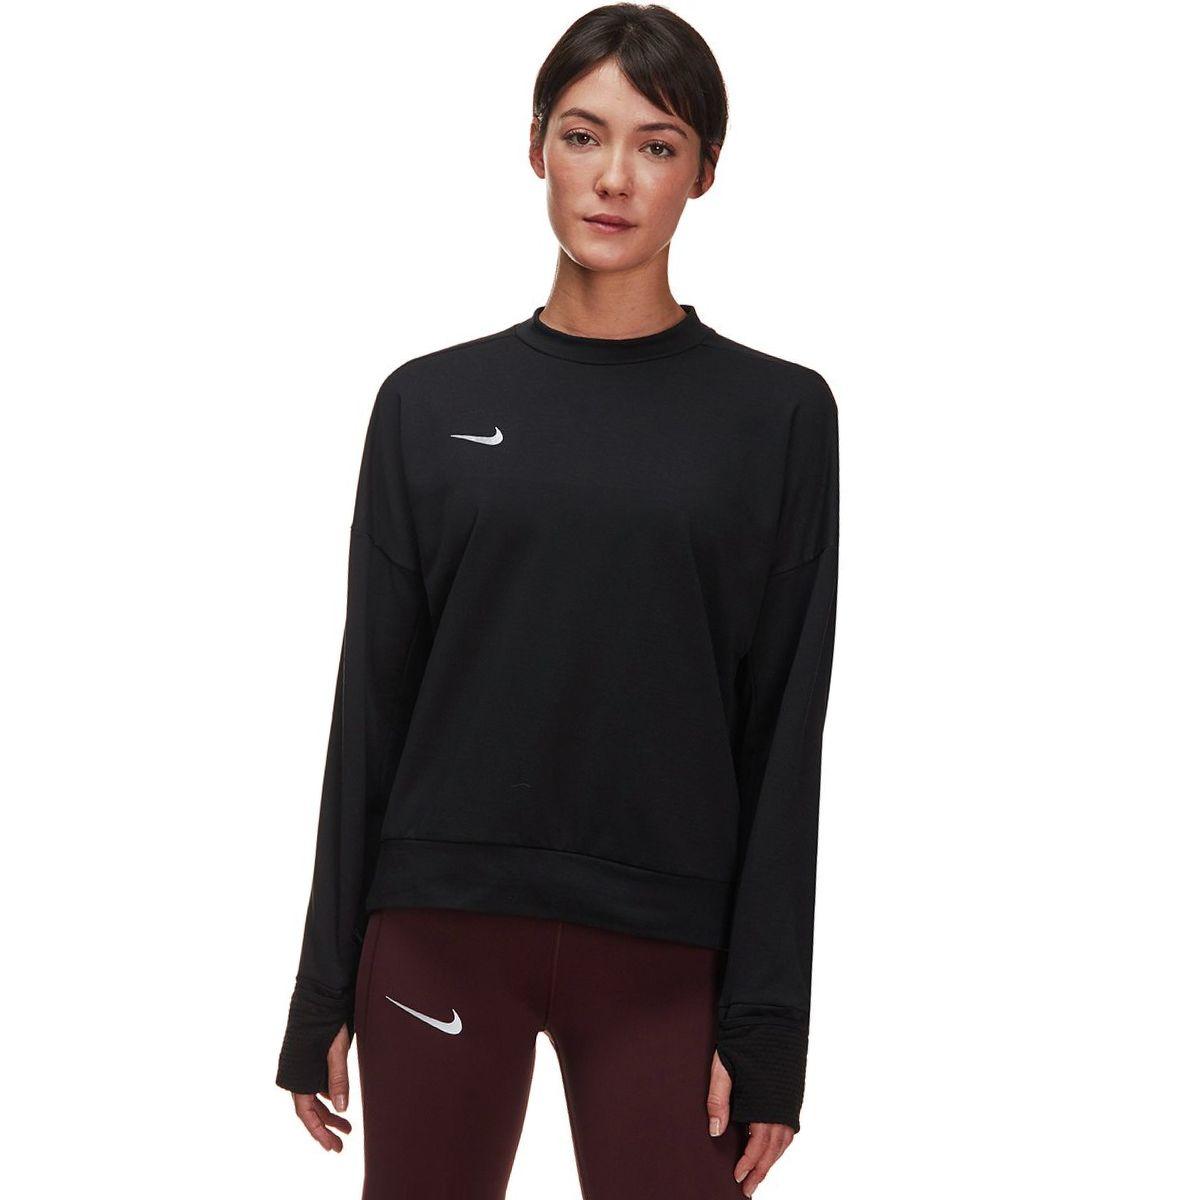 Nike Thermasphere Element 2.0 Crew Top - Women's